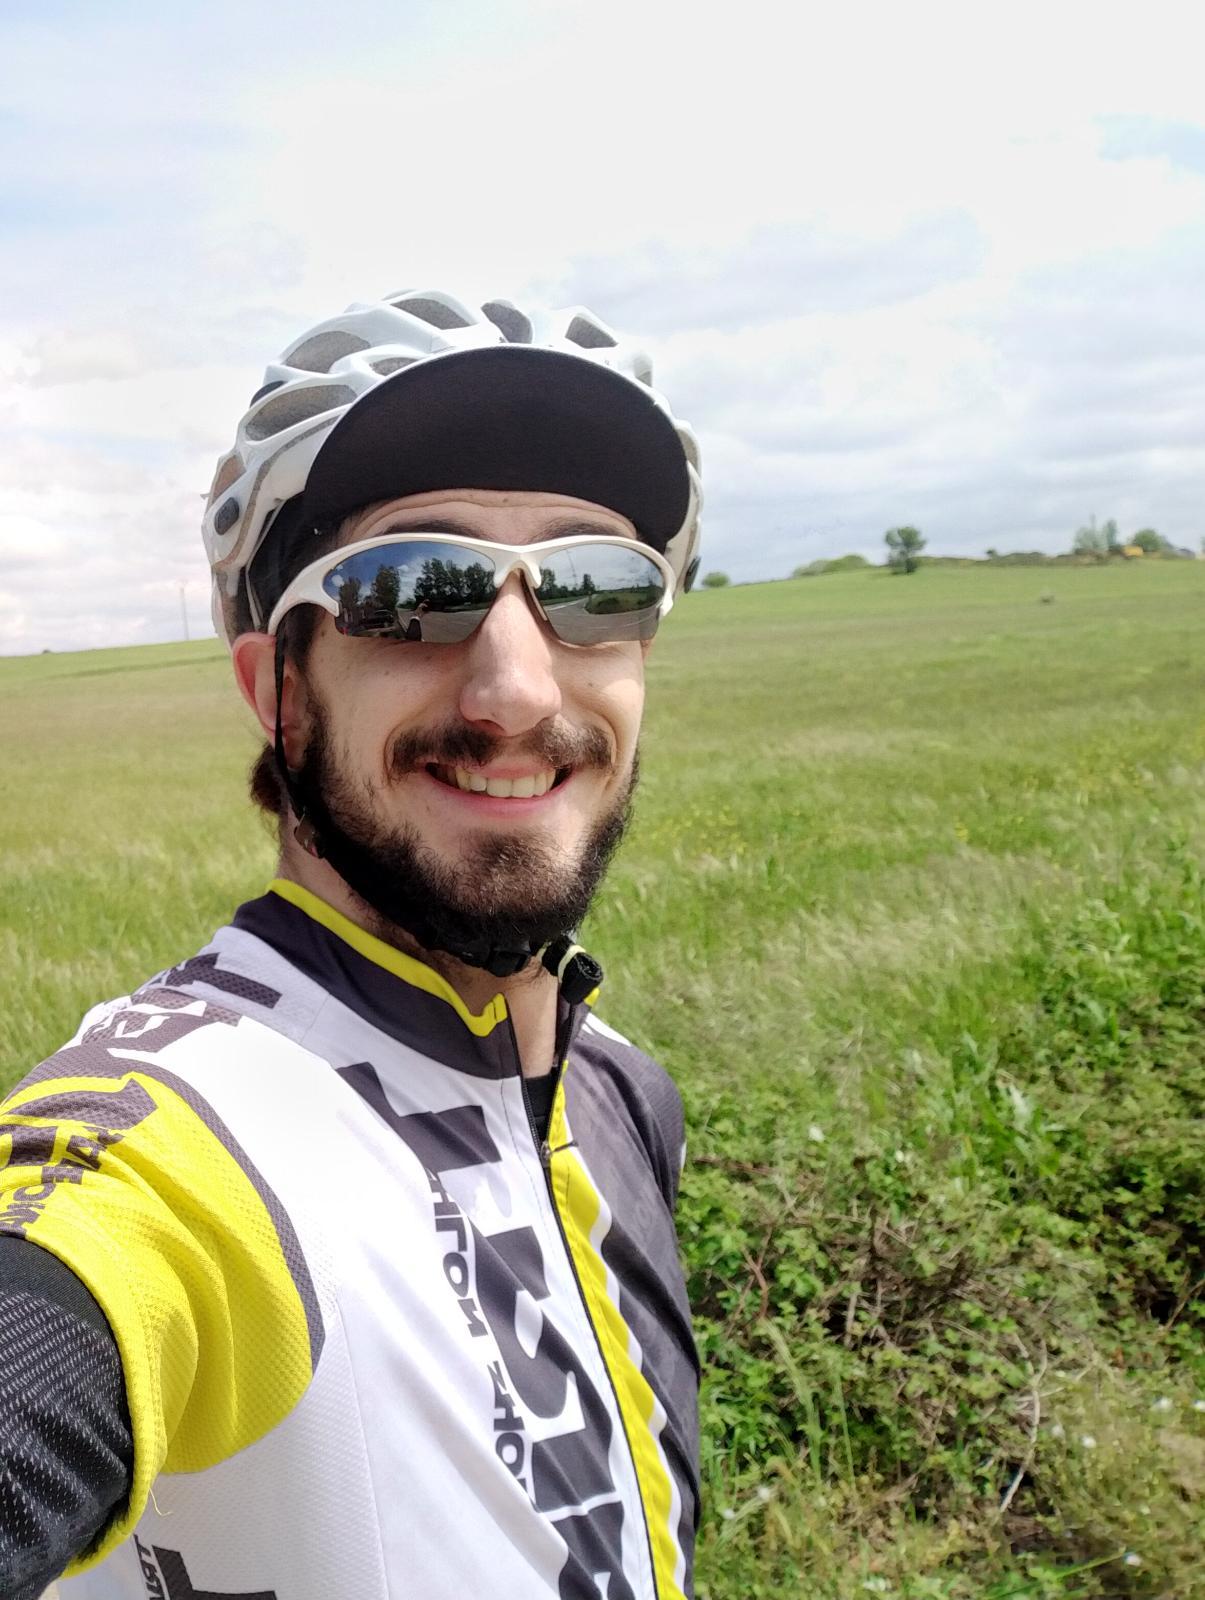 Daniel Pérez, durante un entrenamiento con bicicleta esta semana. FEDEACYL